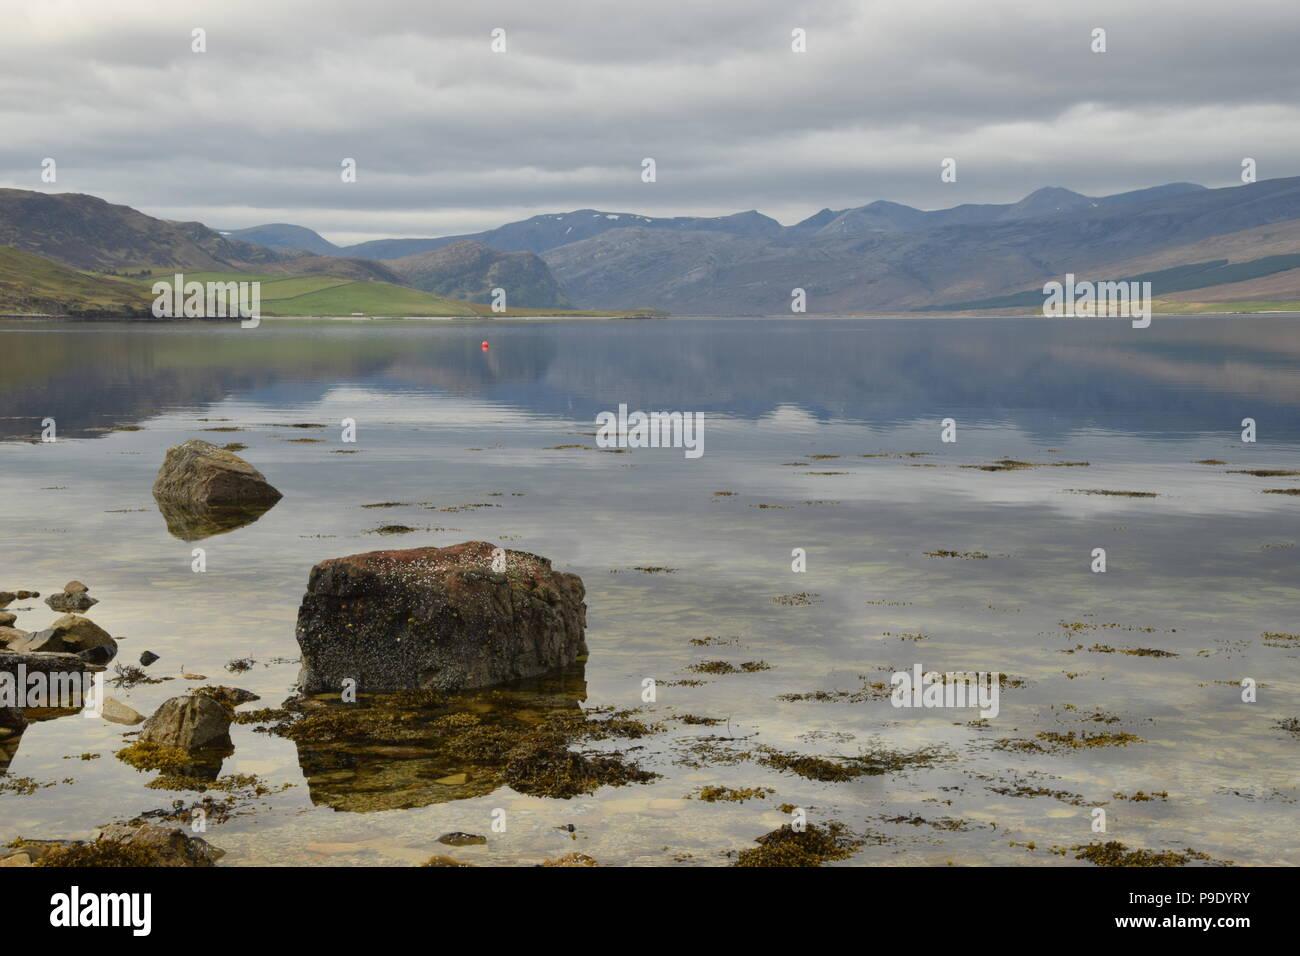 Loch Eribol, Sutherland, Scotland - Stock Image